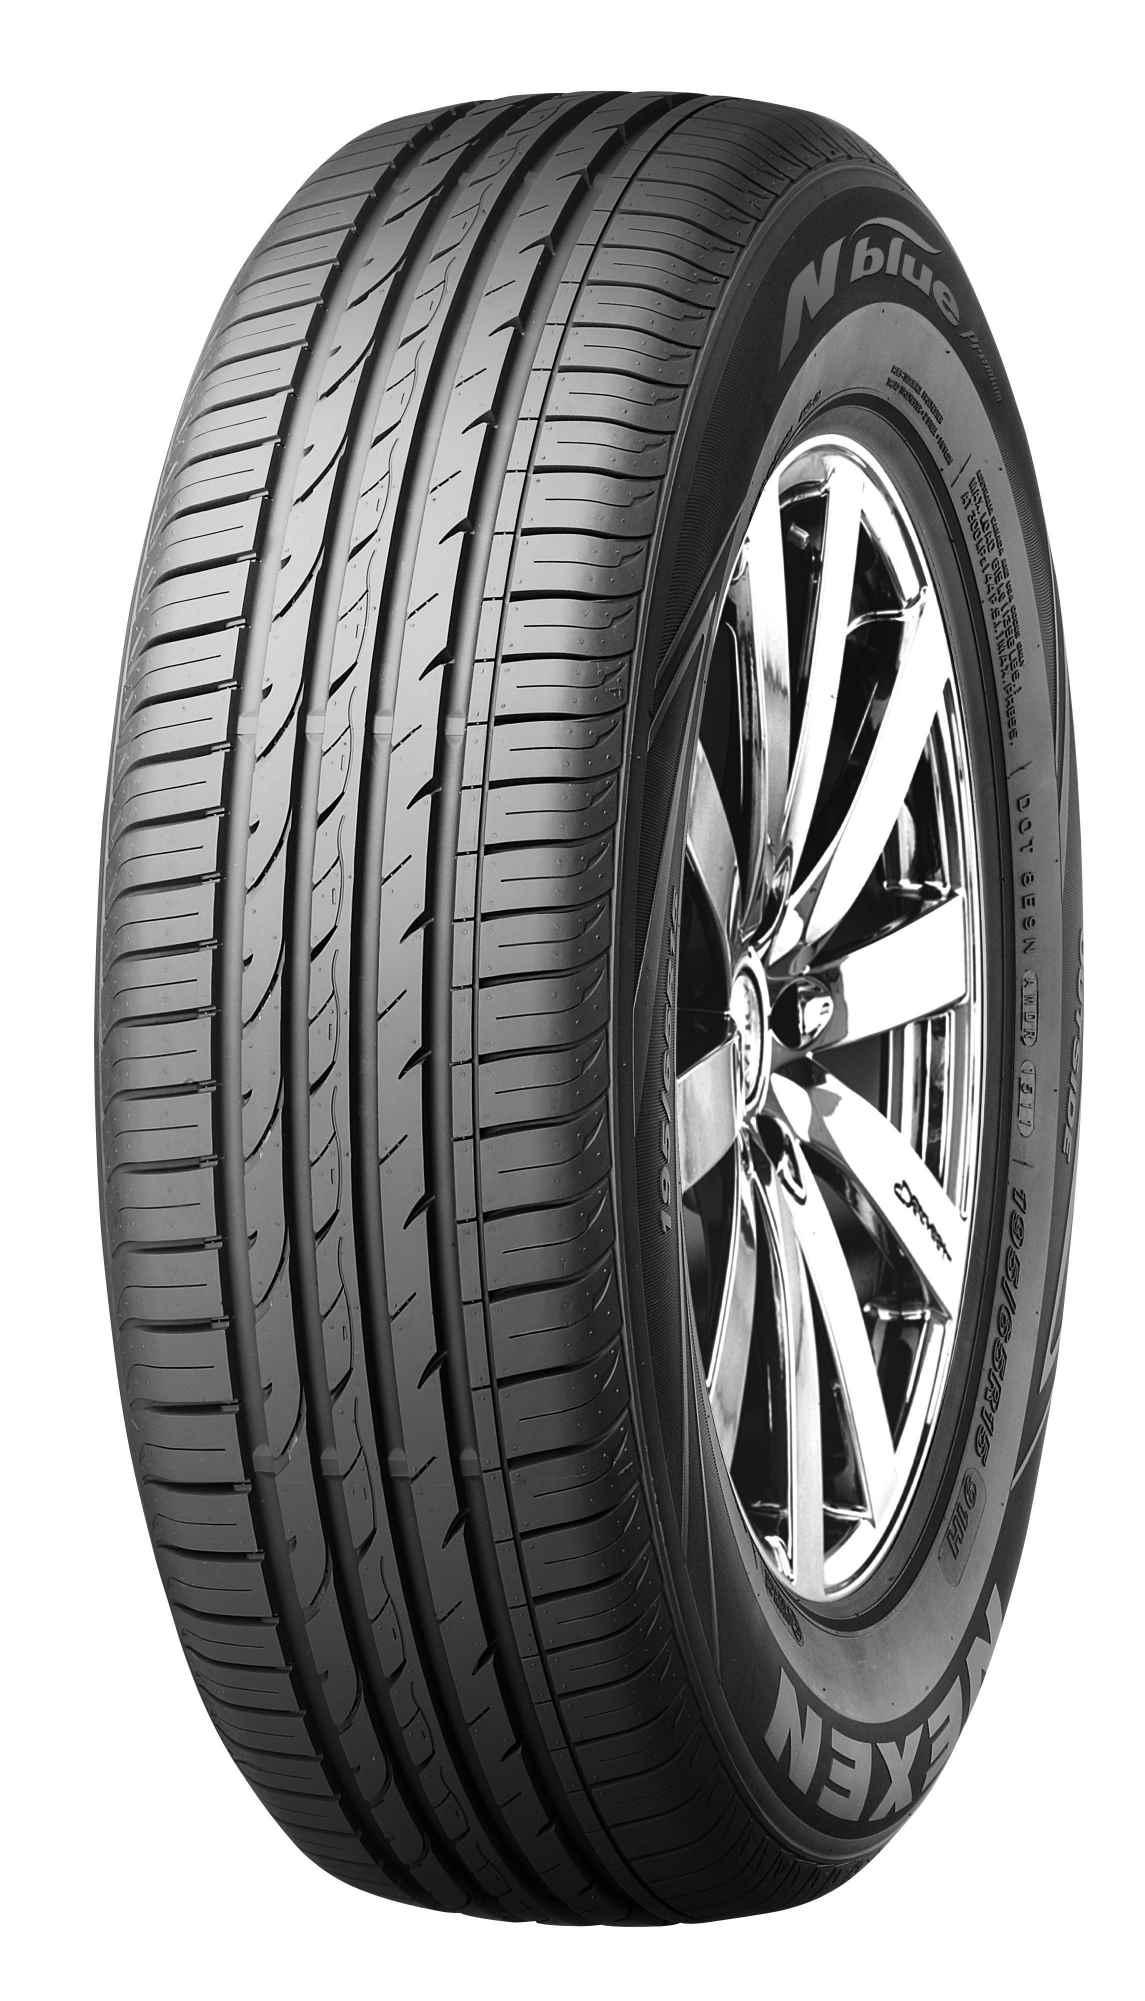 Summer Tyre NEXEN NEXEN NBLUE PREMIUM 165/65R15 81 T